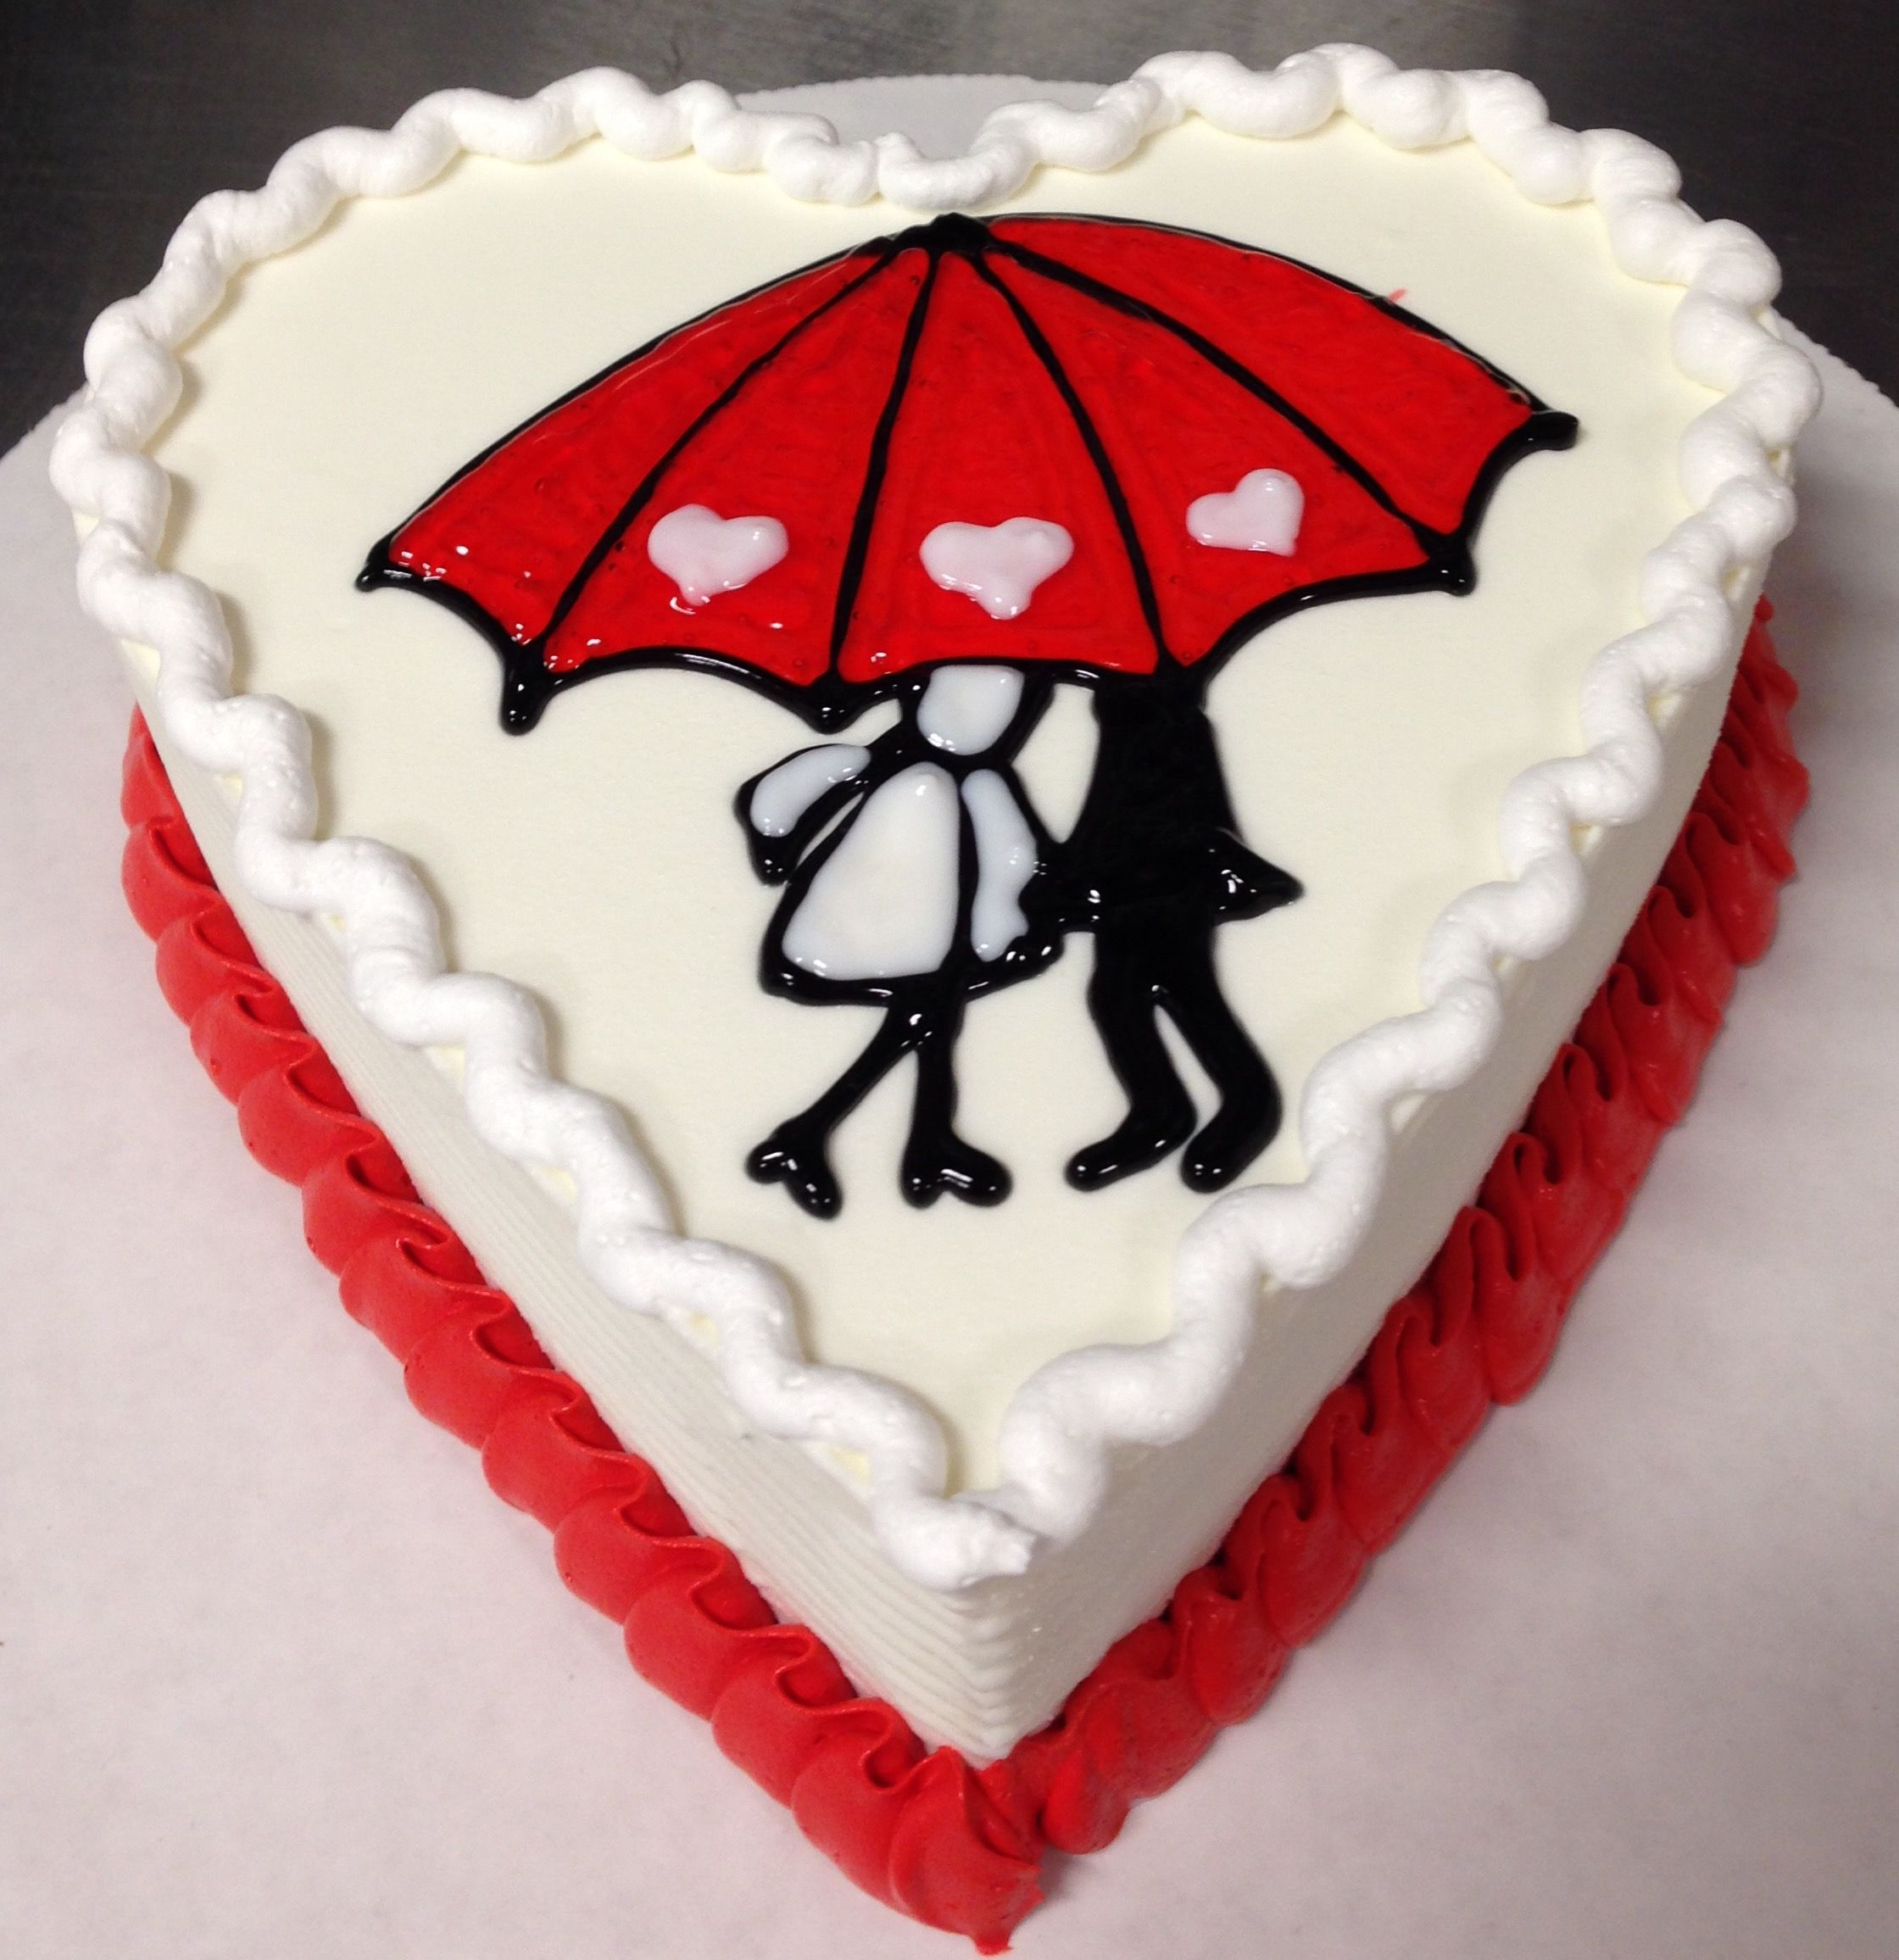 Valentine S Day Dq Mini Heart Ice Cream Cake Dairy Queen Ice Cream Cake Ice Cream Cake Valentines Day Cakes